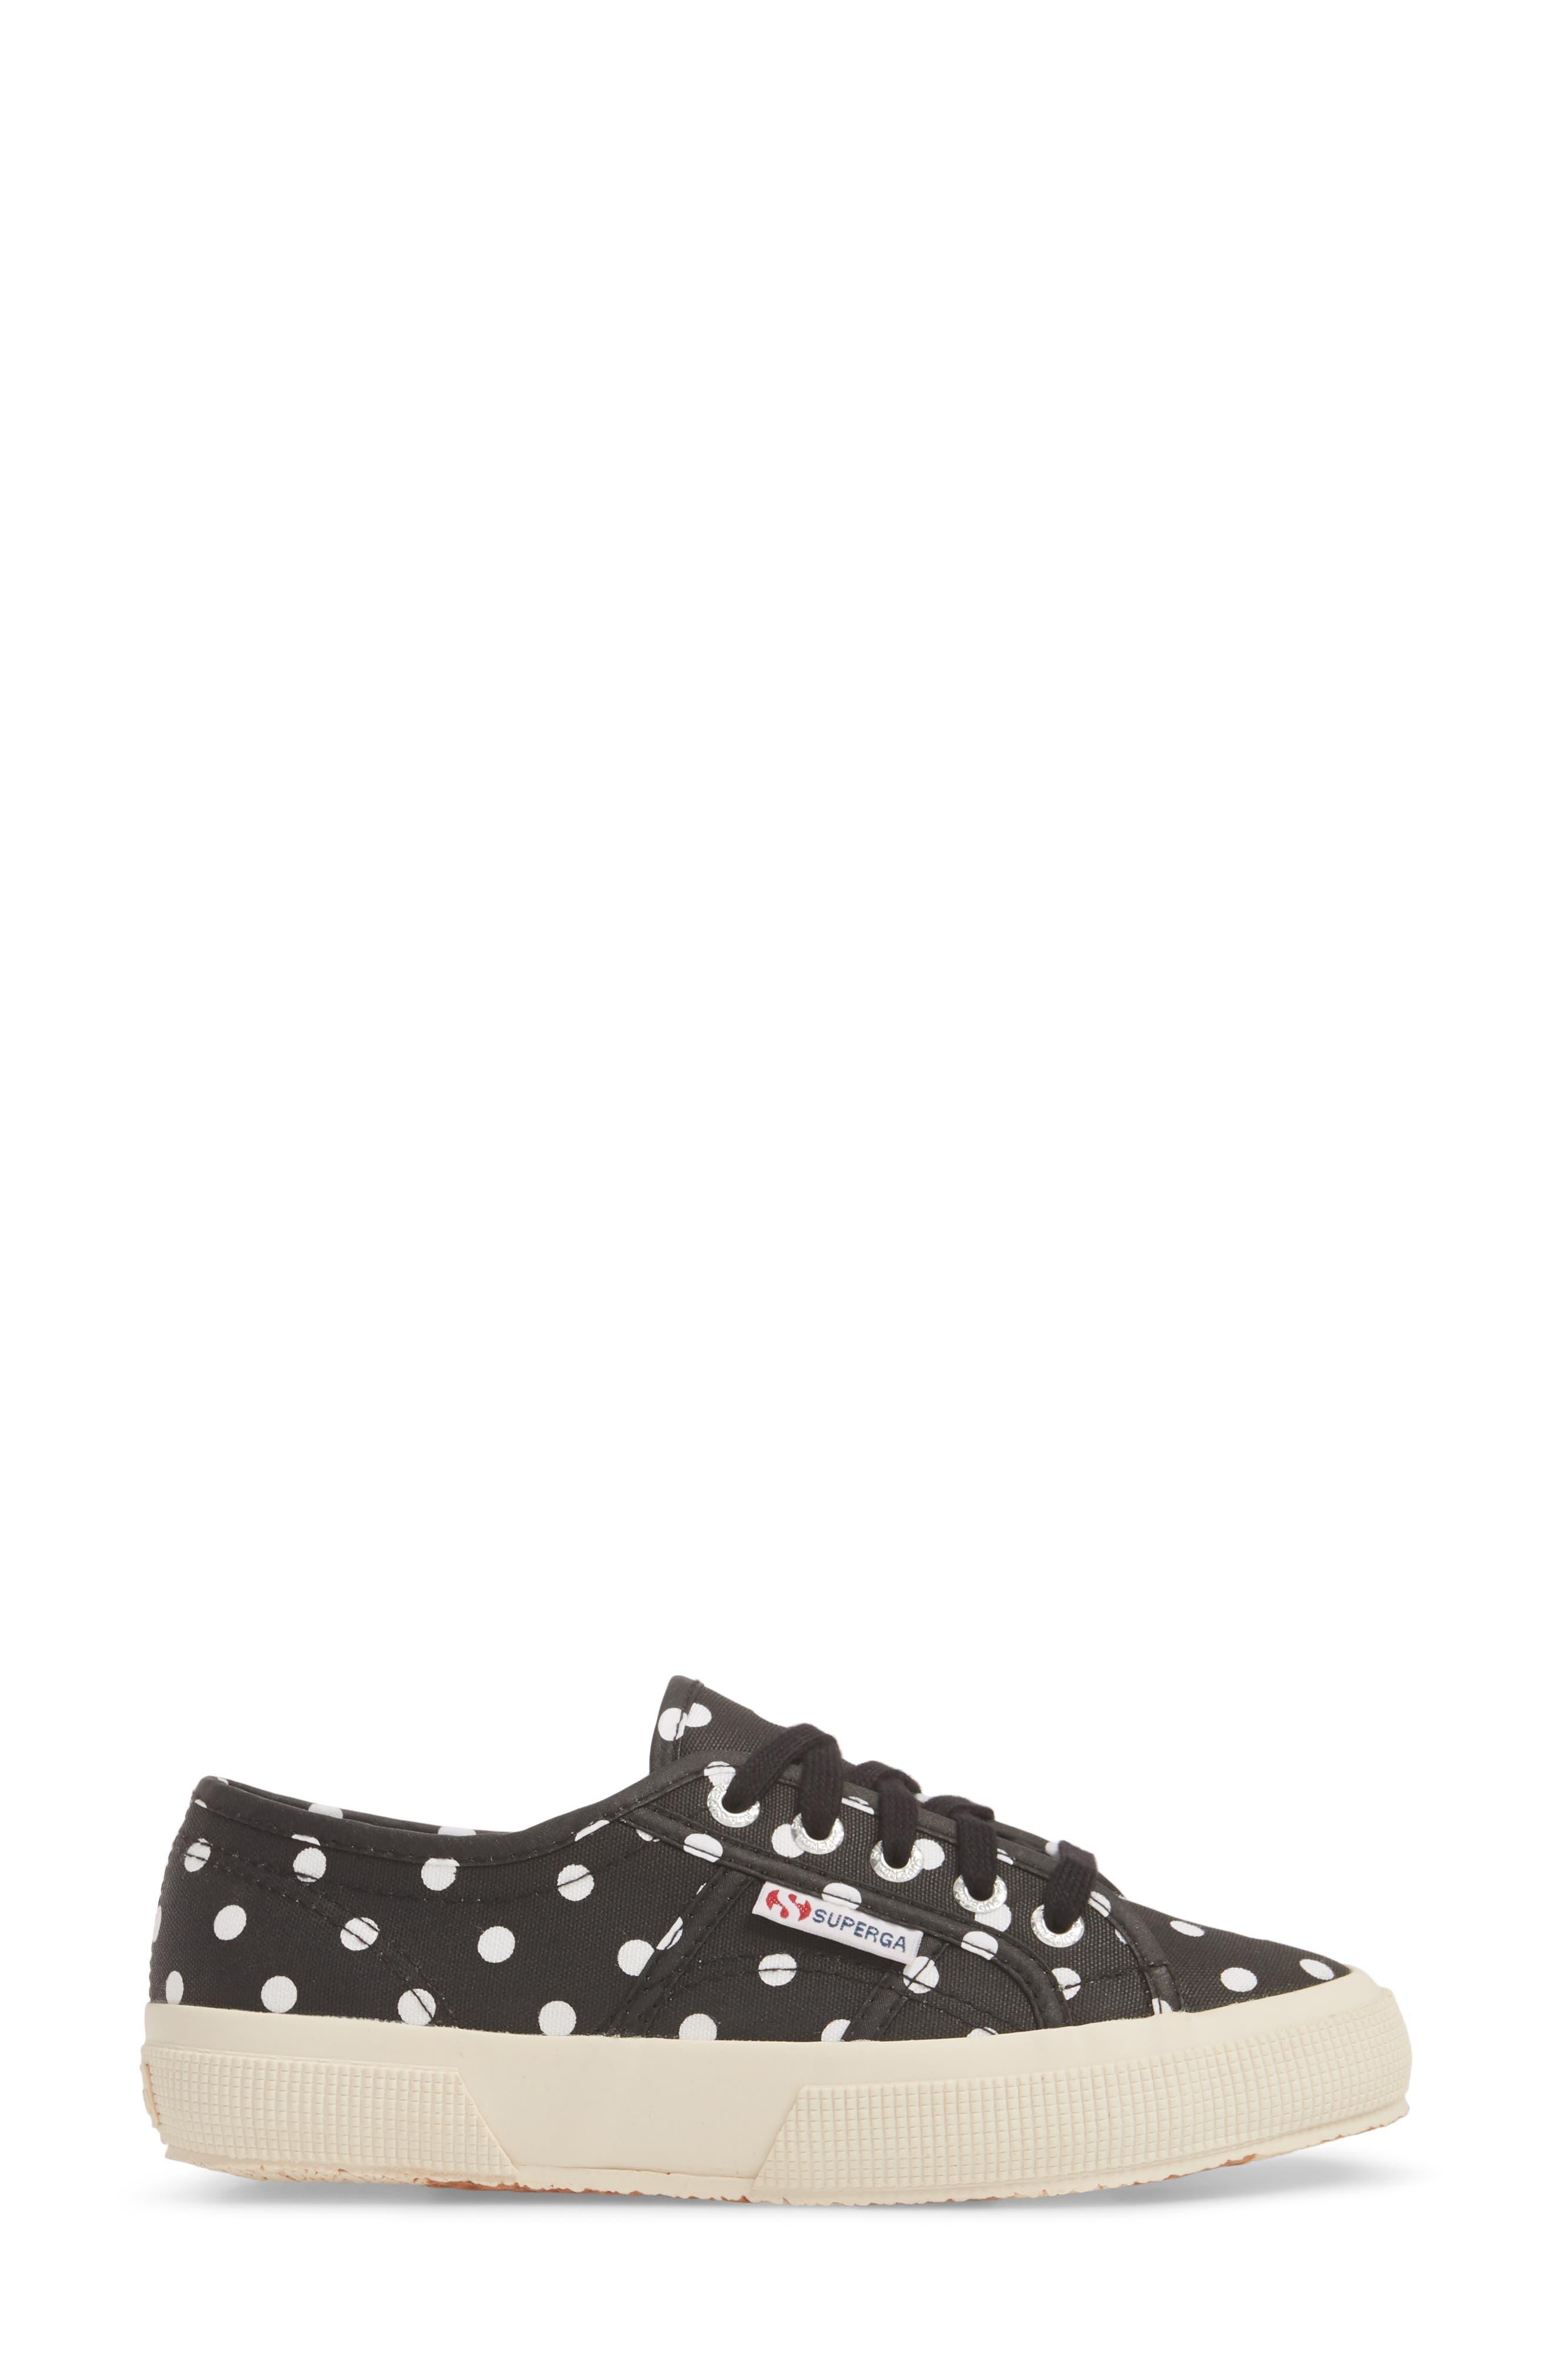 Fantasy Cotu Sneaker,                             Alternate thumbnail 4, color,                             Black Multi